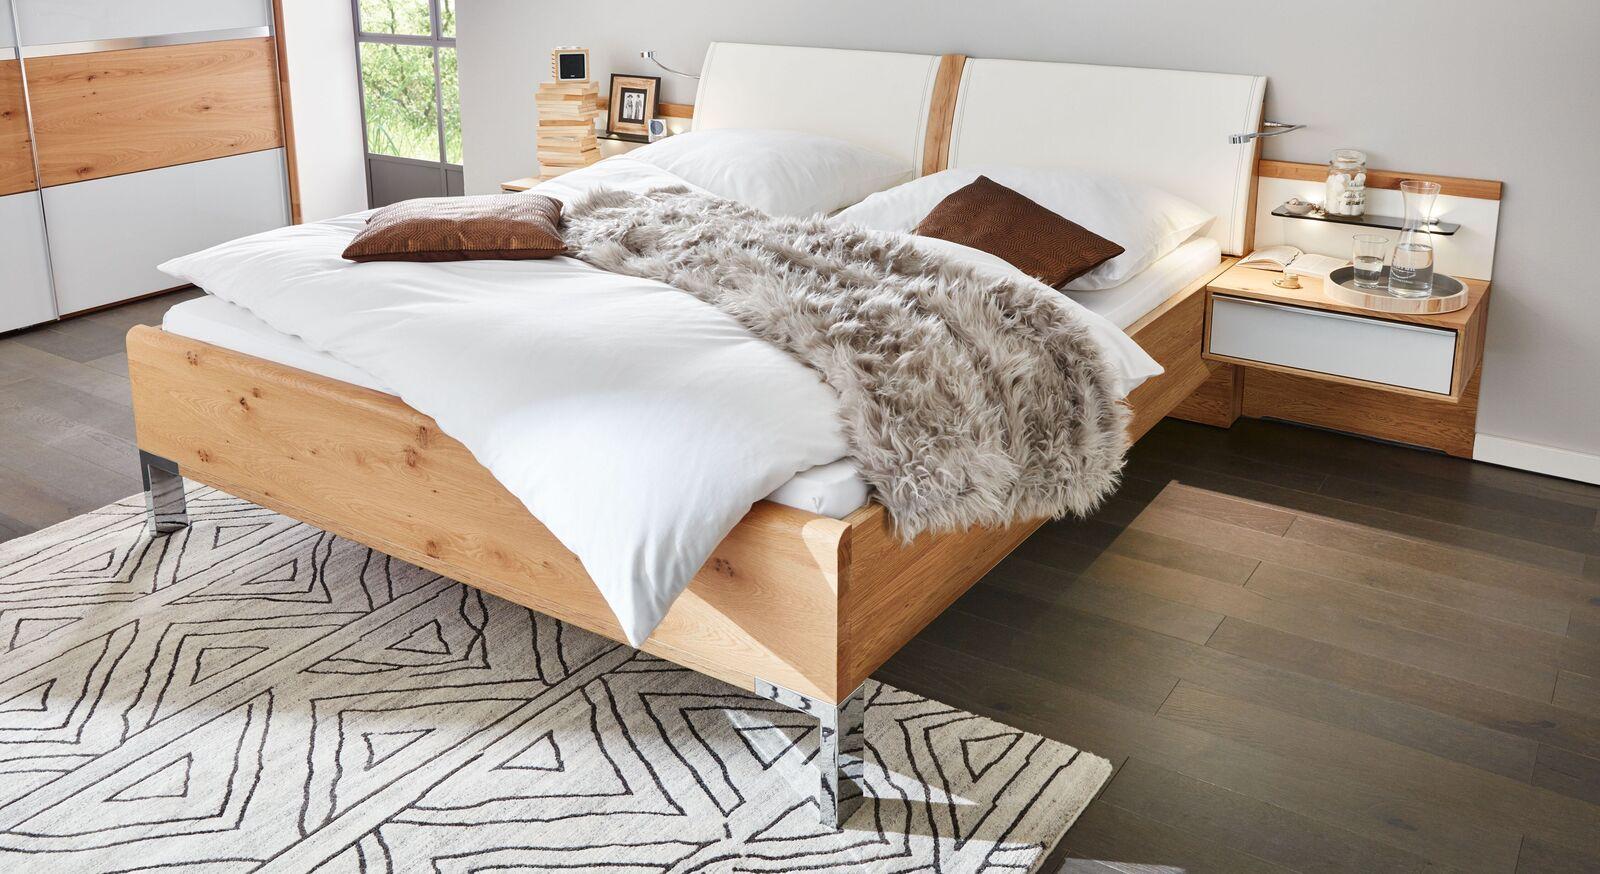 INTERLIVING Bett 1202 mit elegantem Holzrahmen